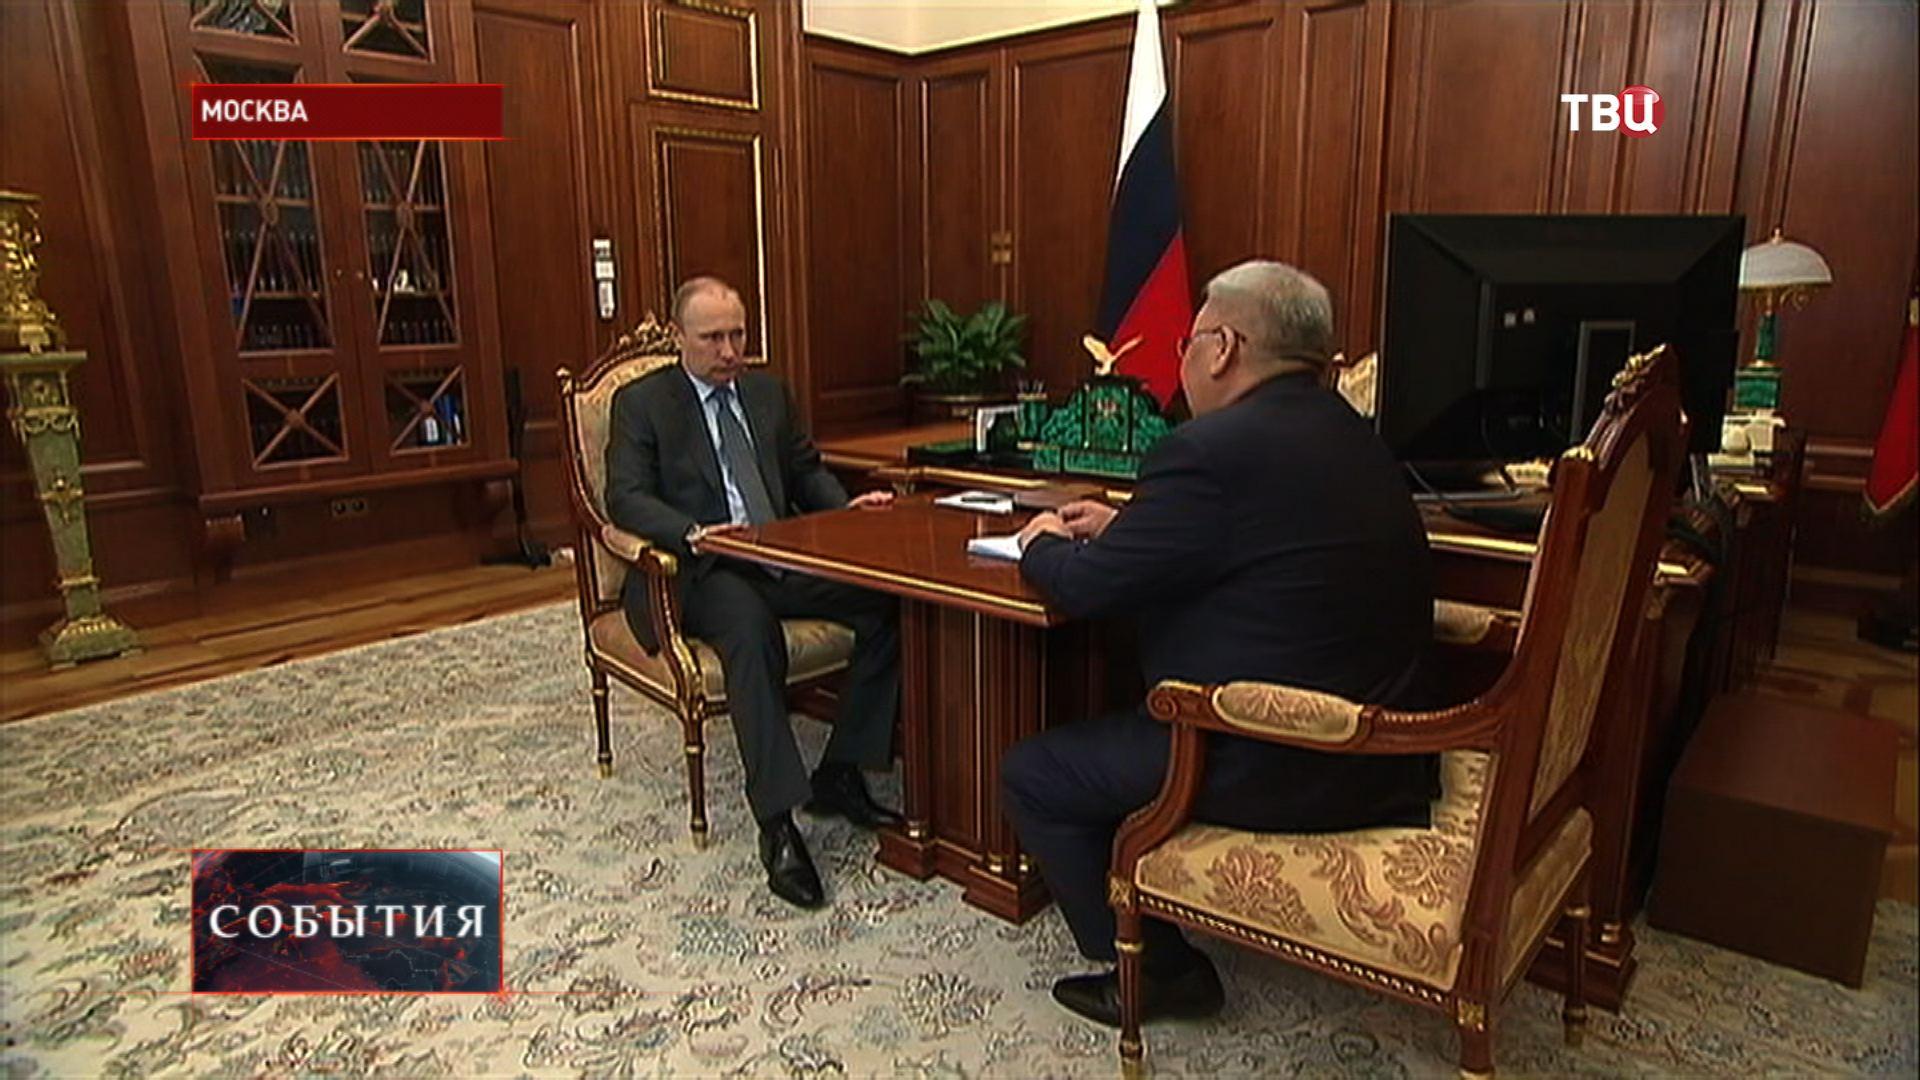 Владимир Путин и глава республики Саха-Якутии Егор Борисов